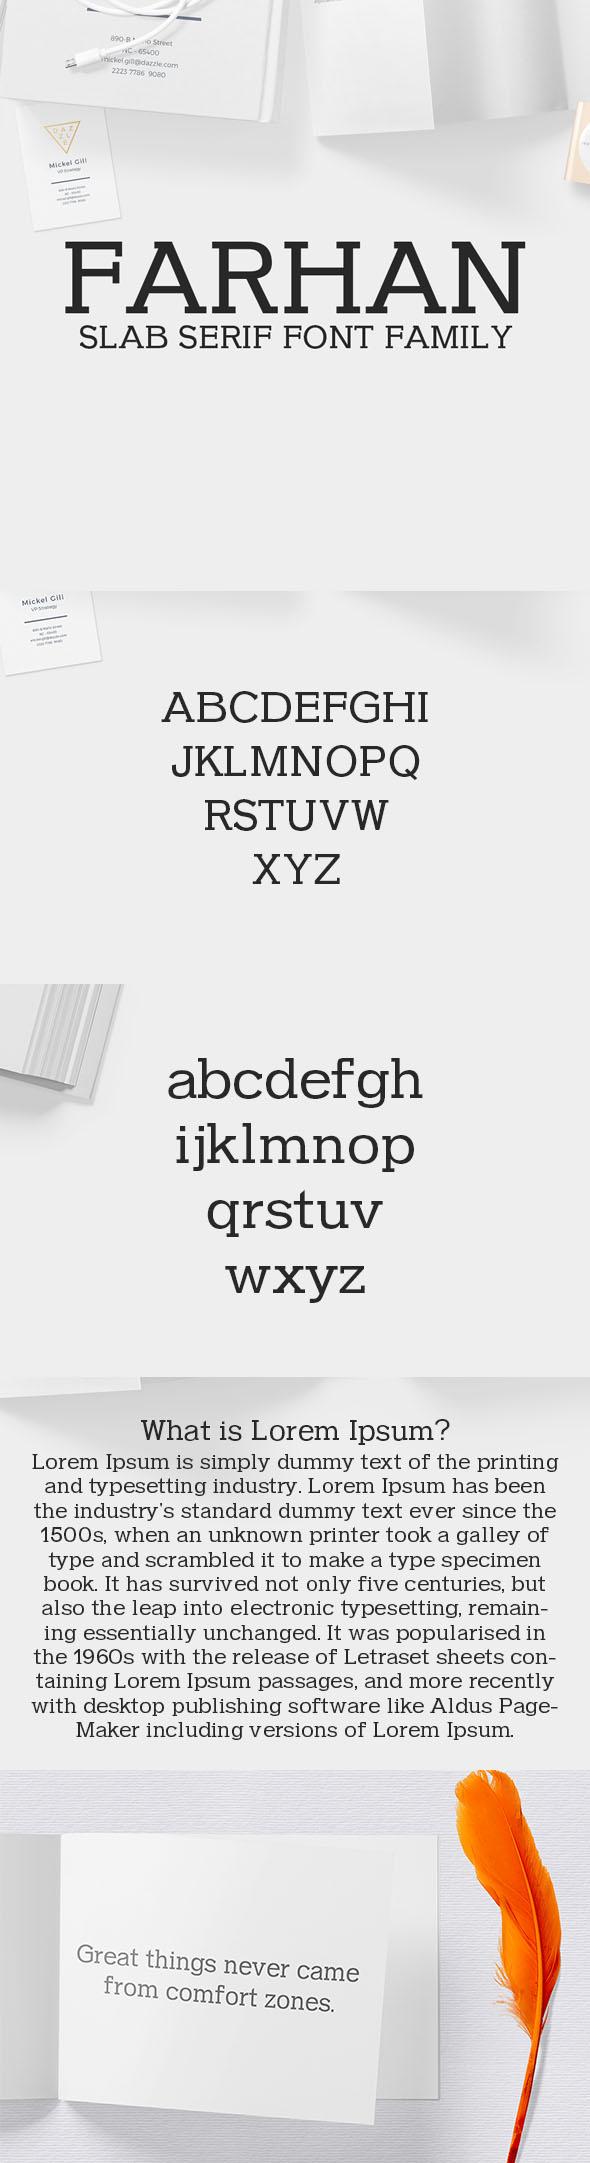 Farhan Slab Serif 5 Font Pack - Sans-Serif Fonts